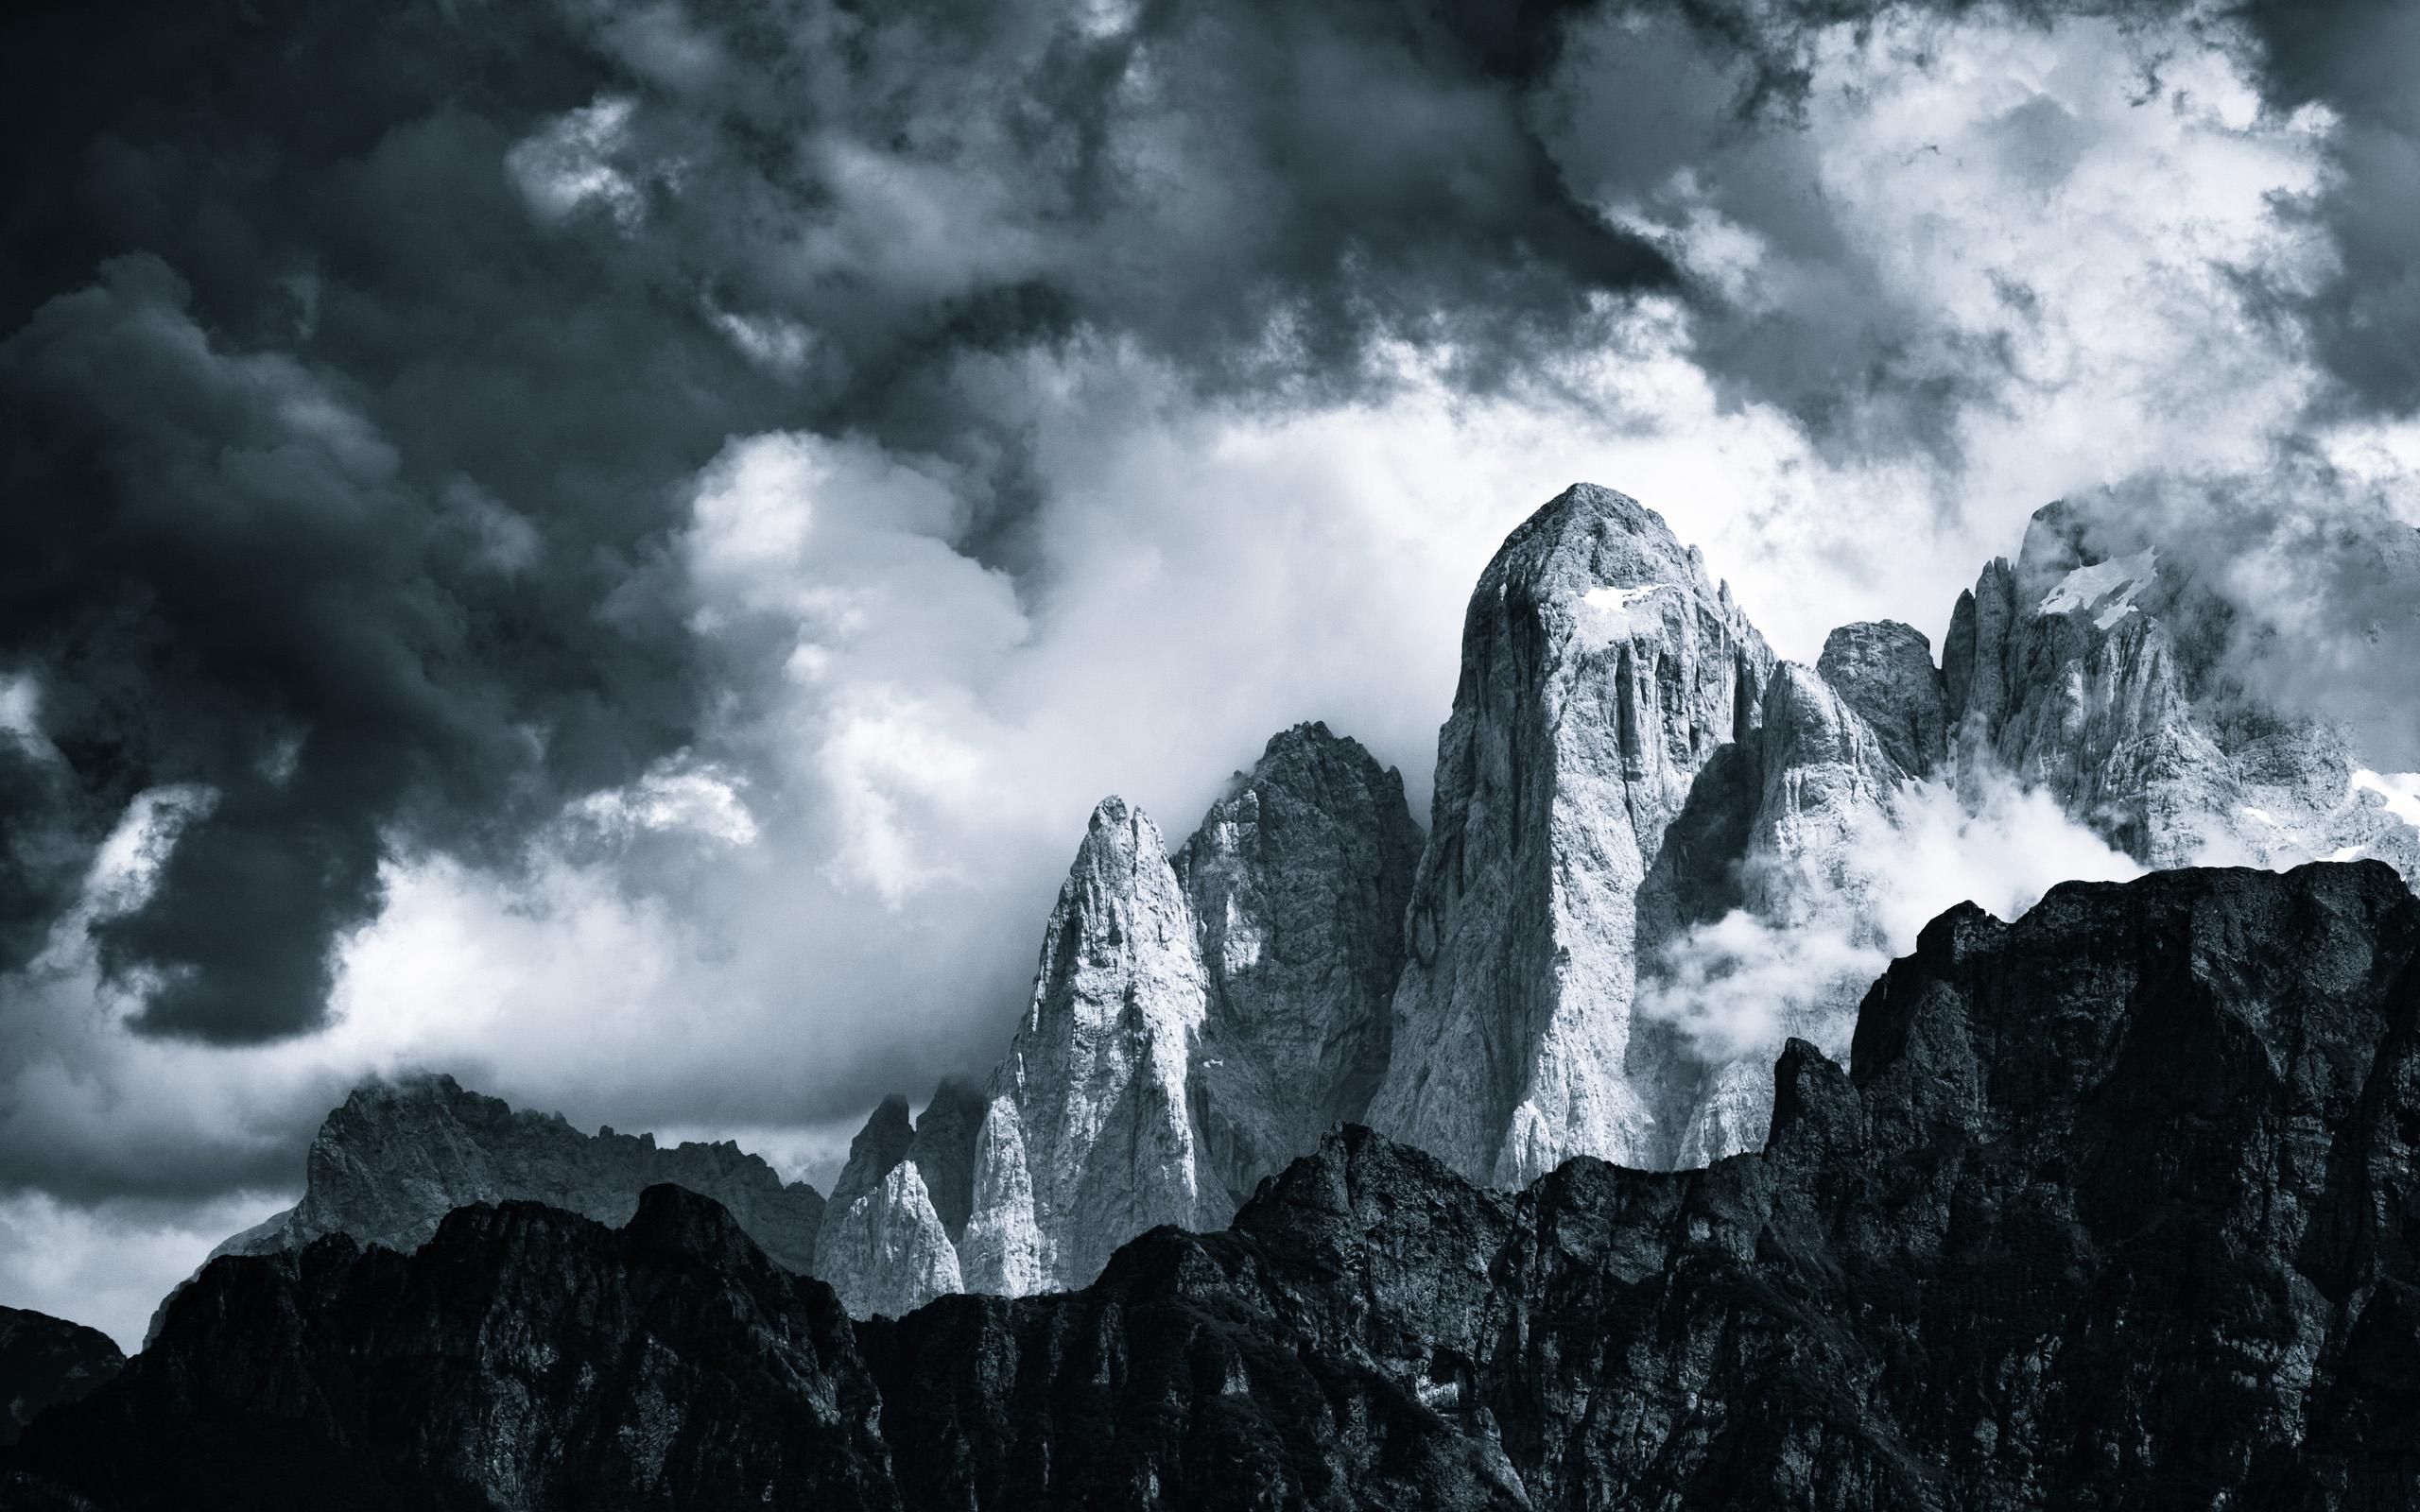 nature Landscapes Mountains Monochrome Black White Sky 2560x1600